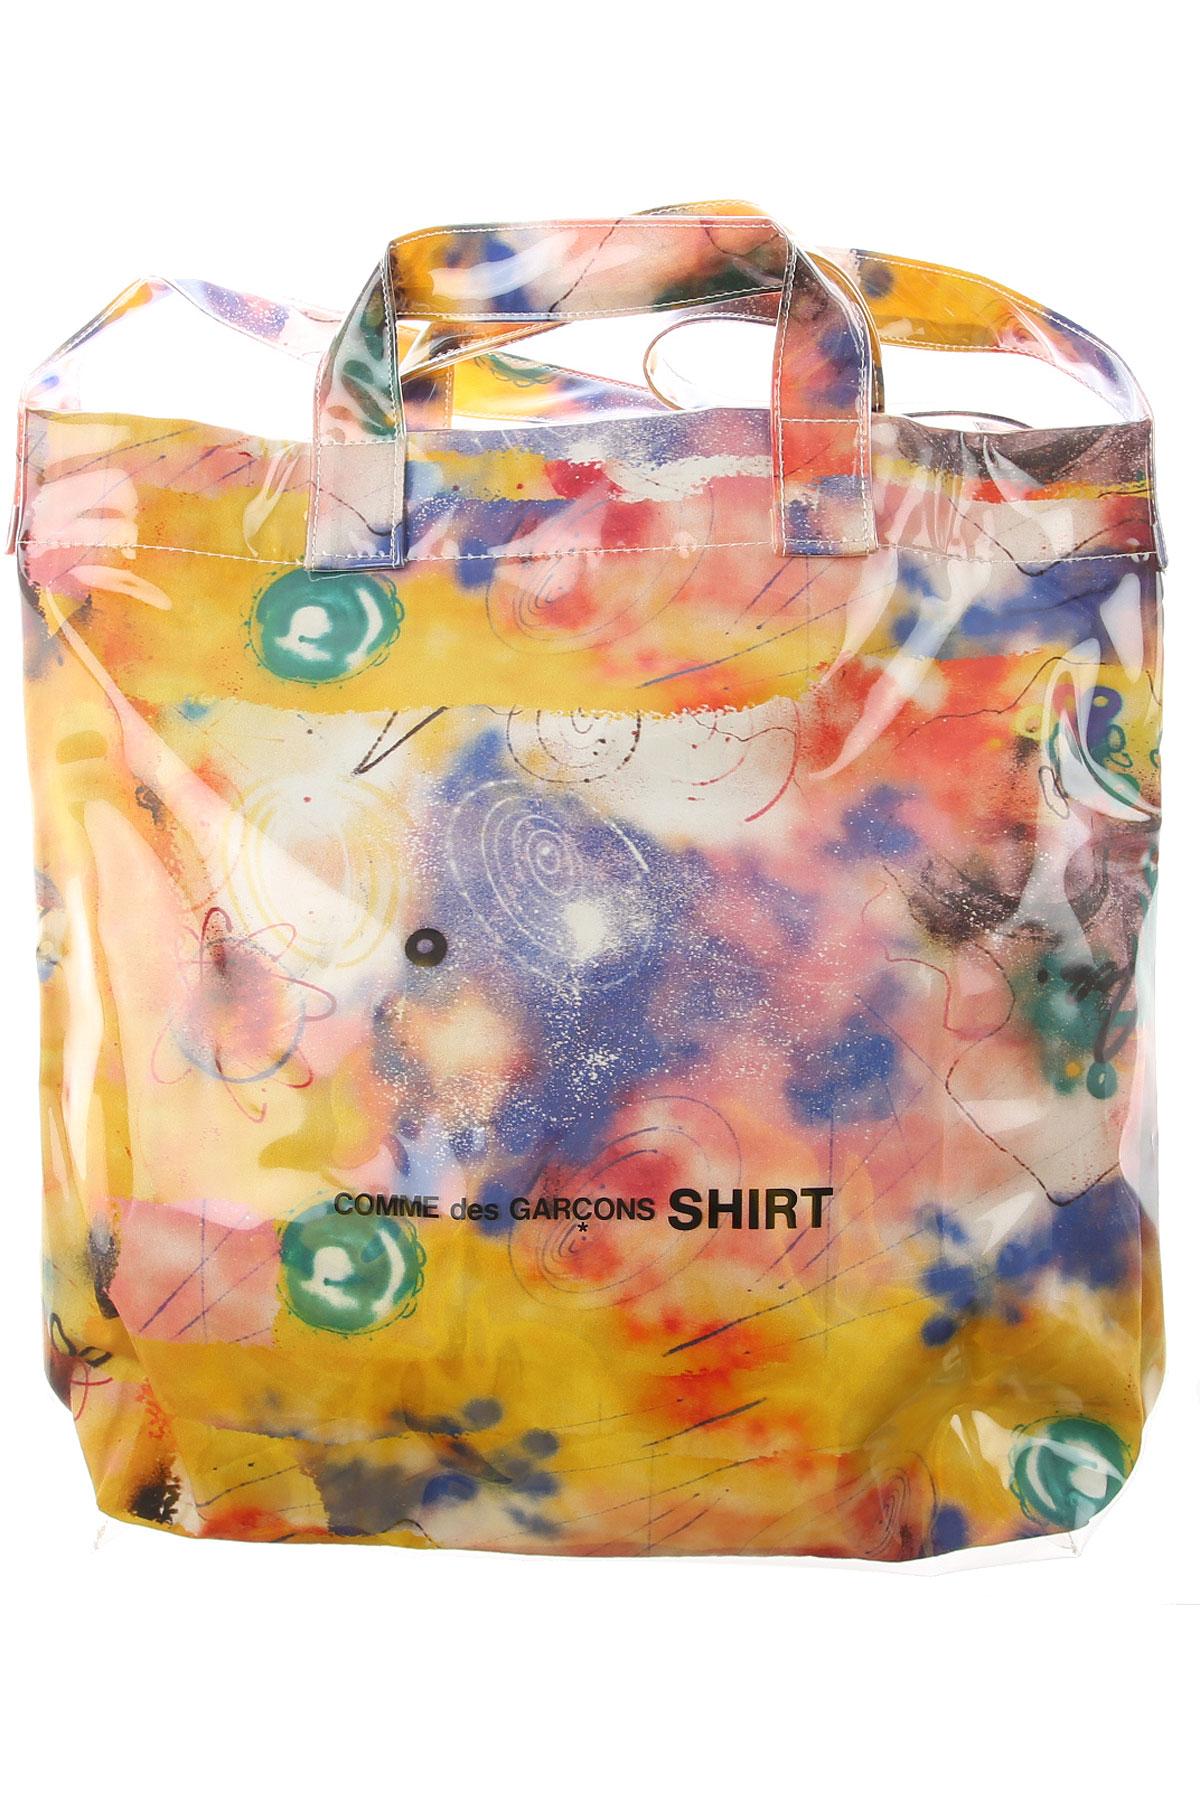 Comme des Garcons Top Handle Handbag, Yellow, polyurethane, 2019